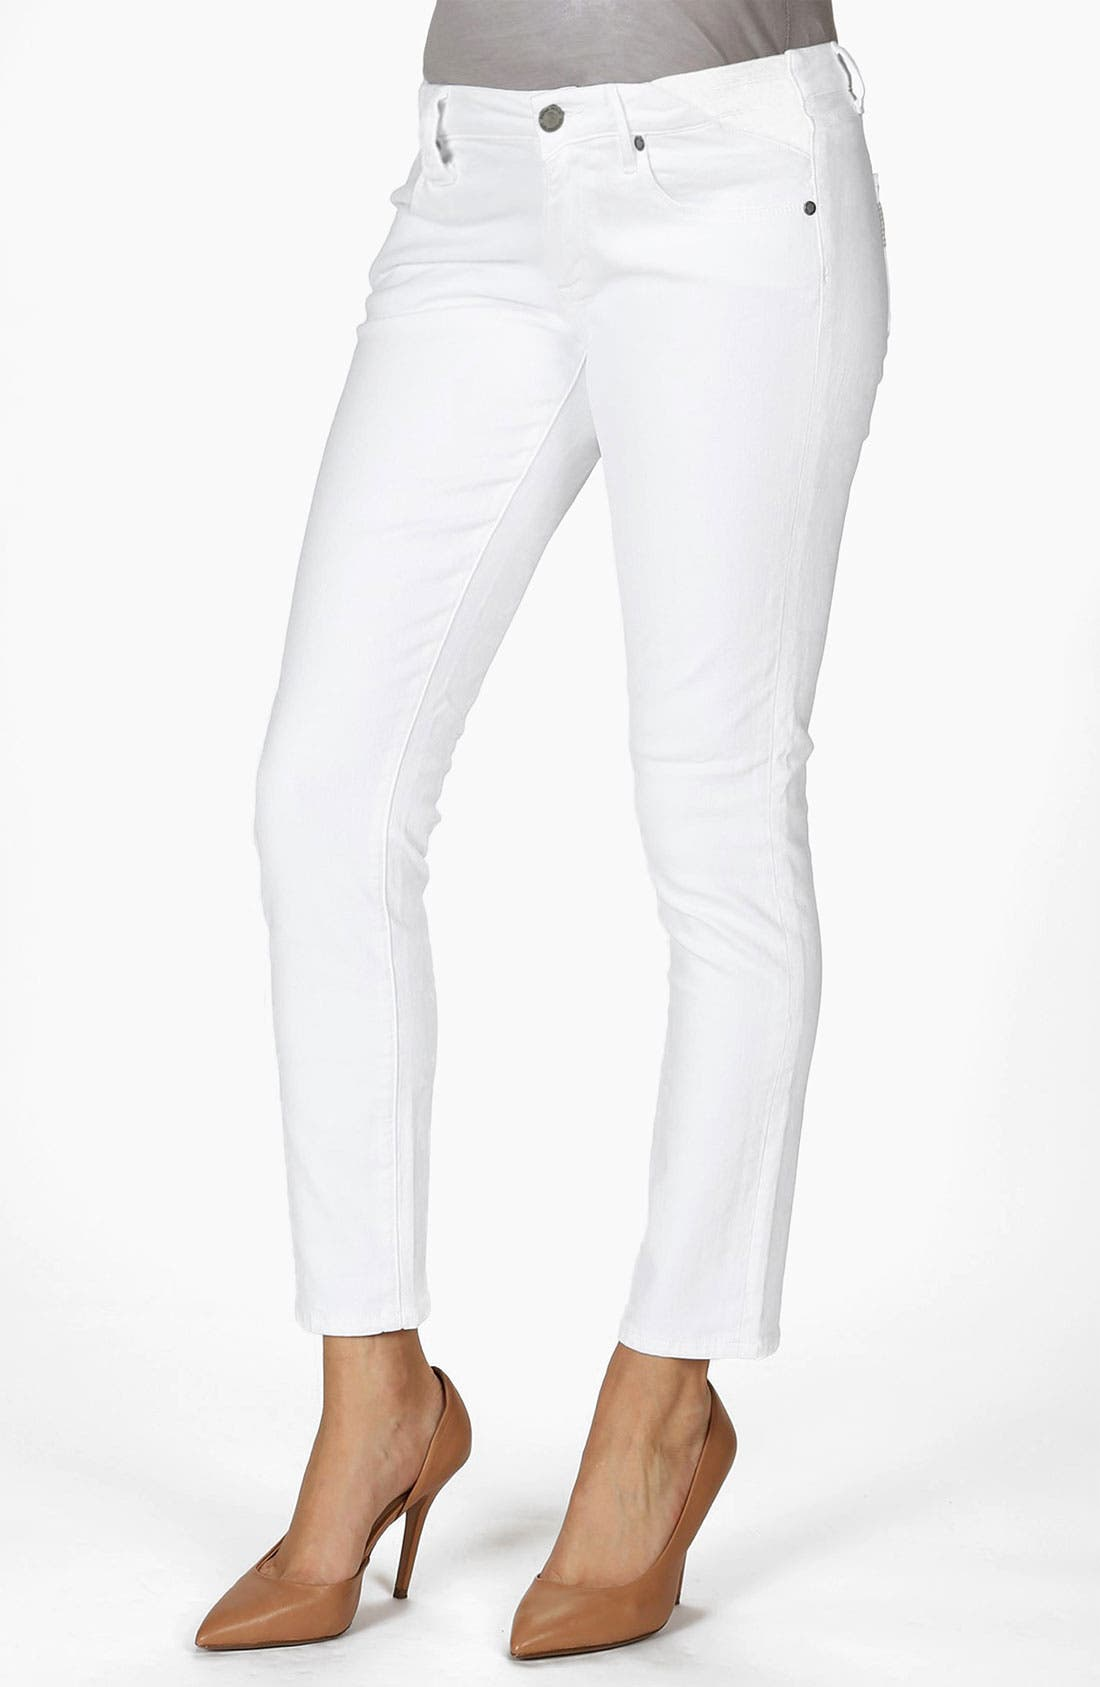 Main Image - Paige Denim 'Skyline' Maternity Ankle Skinny Stretch Jeans (Optic White)